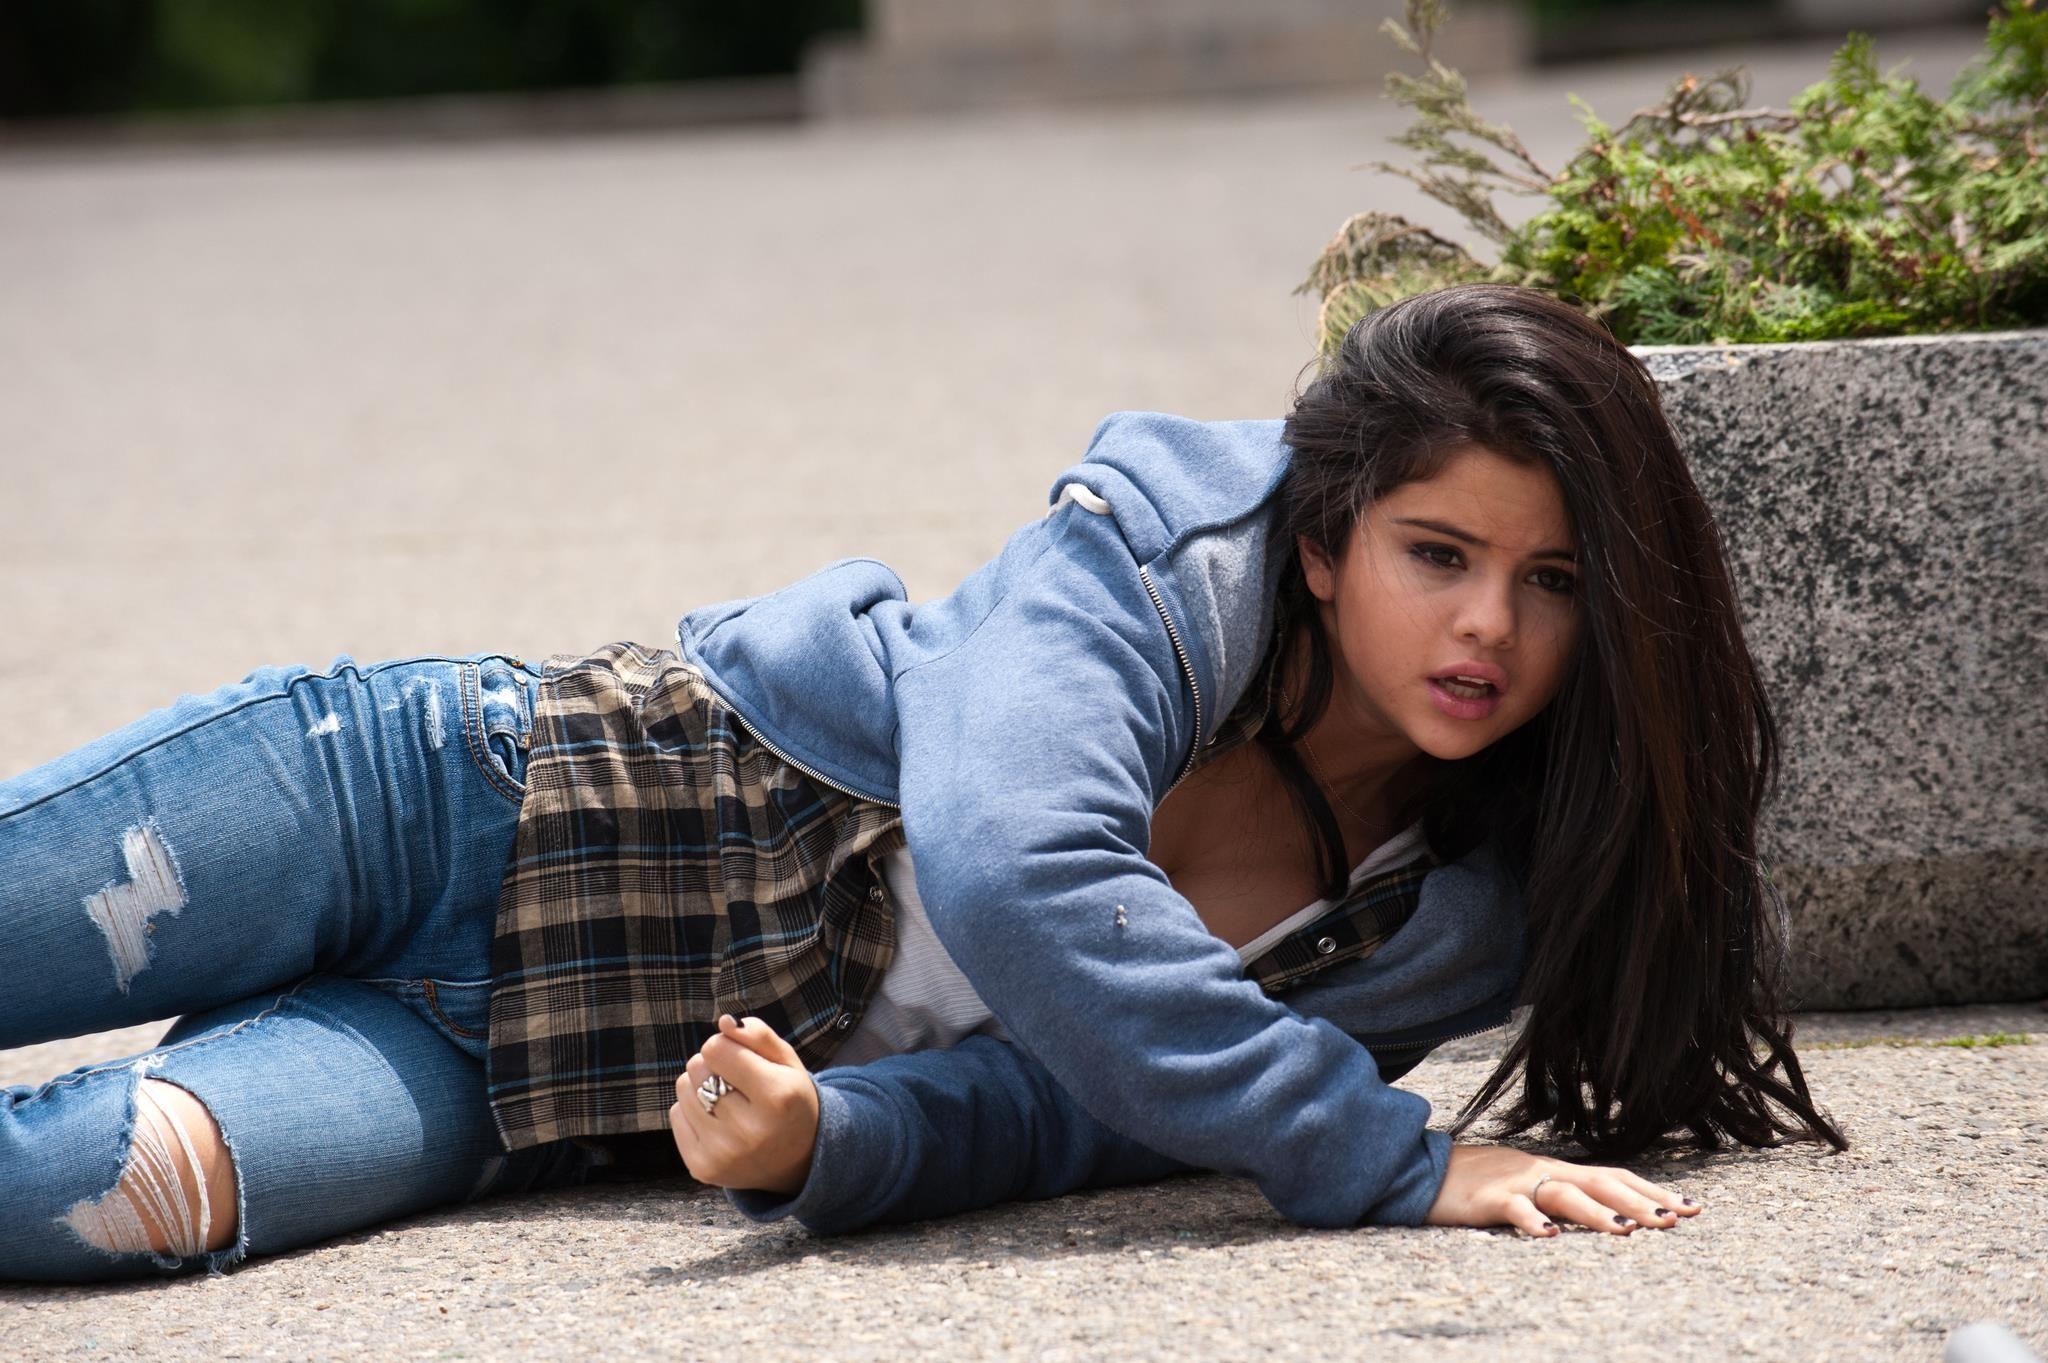 Selena Gomez Action In Getaway Movie Chordarea Com Lyrics Chords Selena Gomez Selena Gomez Photos Selena